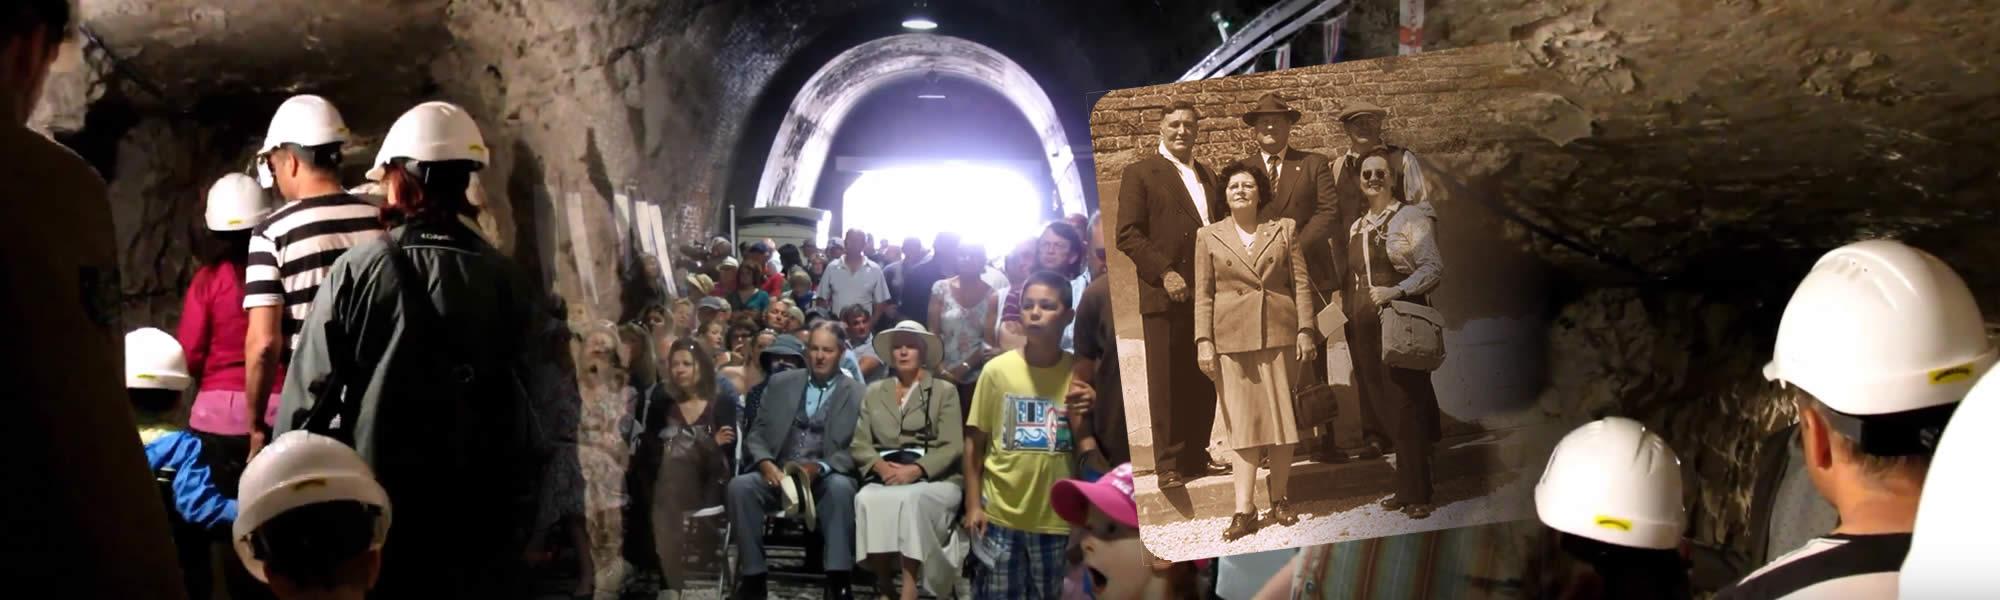 The Ramsgate Tunnels - Visit Ramsgate